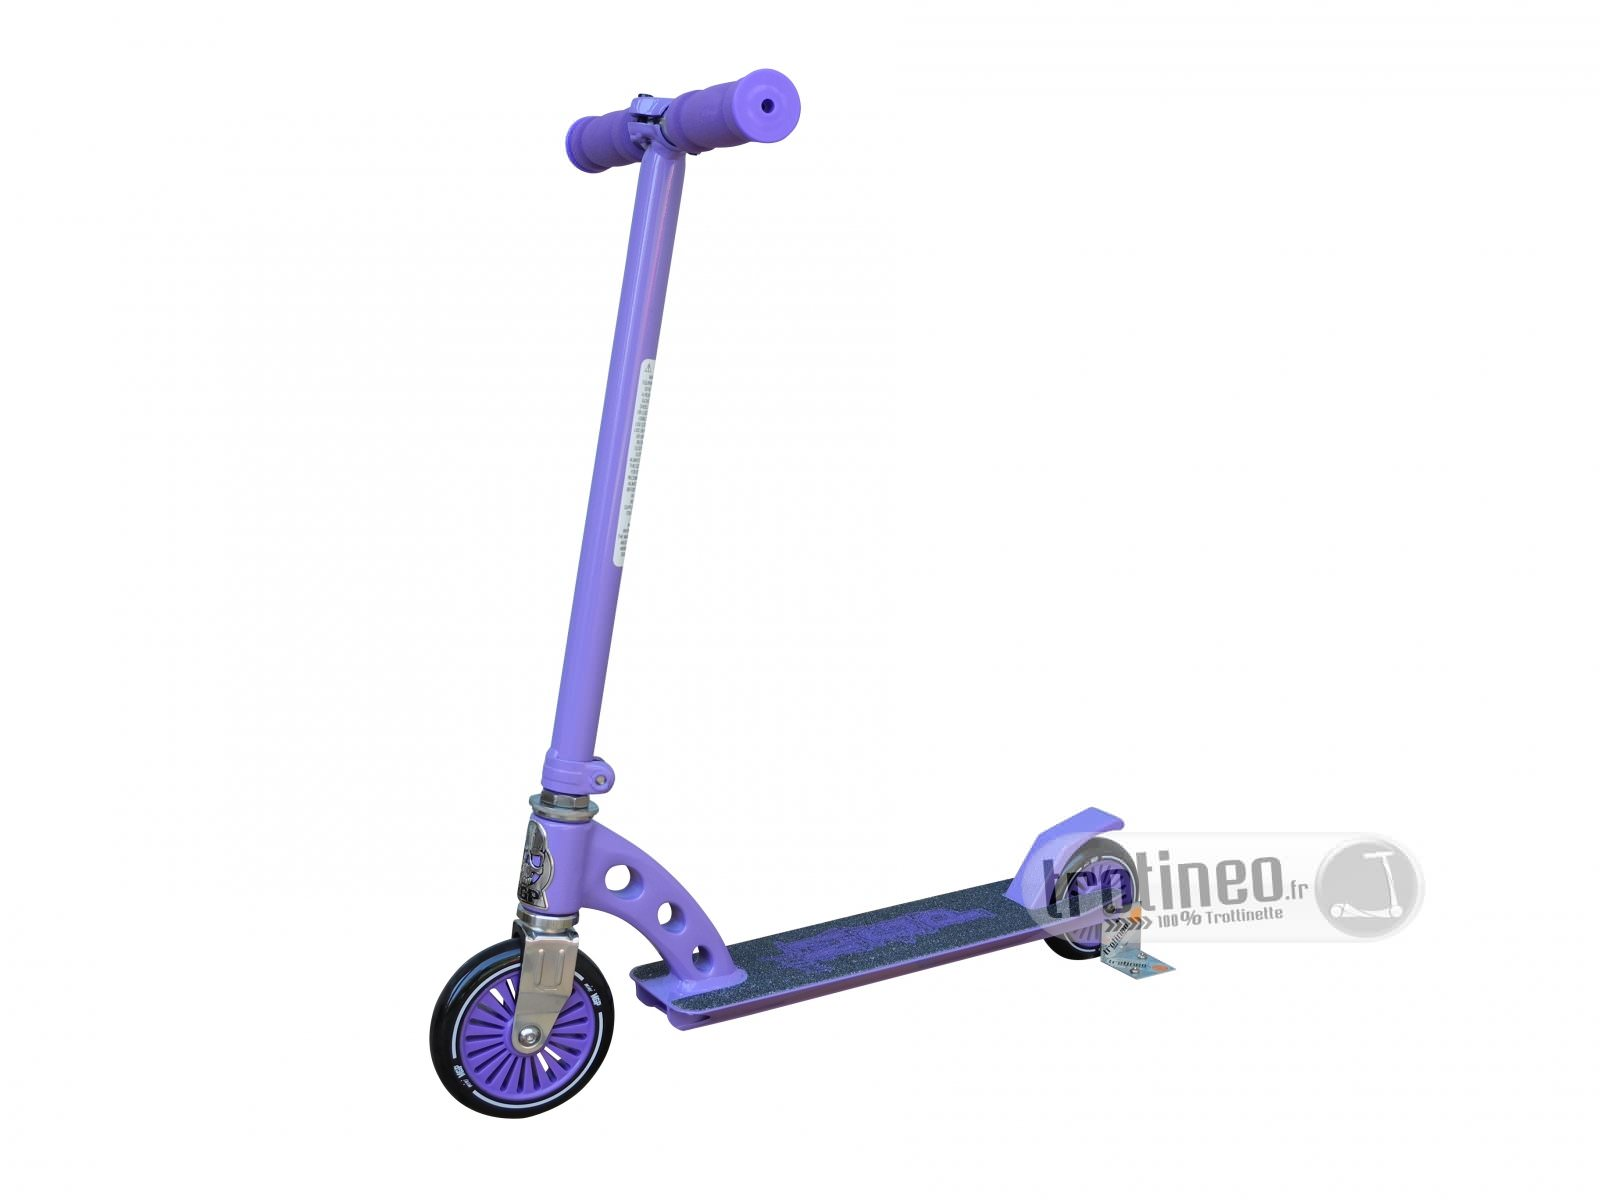 madd mini mgp violette trottinette trotineo. Black Bedroom Furniture Sets. Home Design Ideas